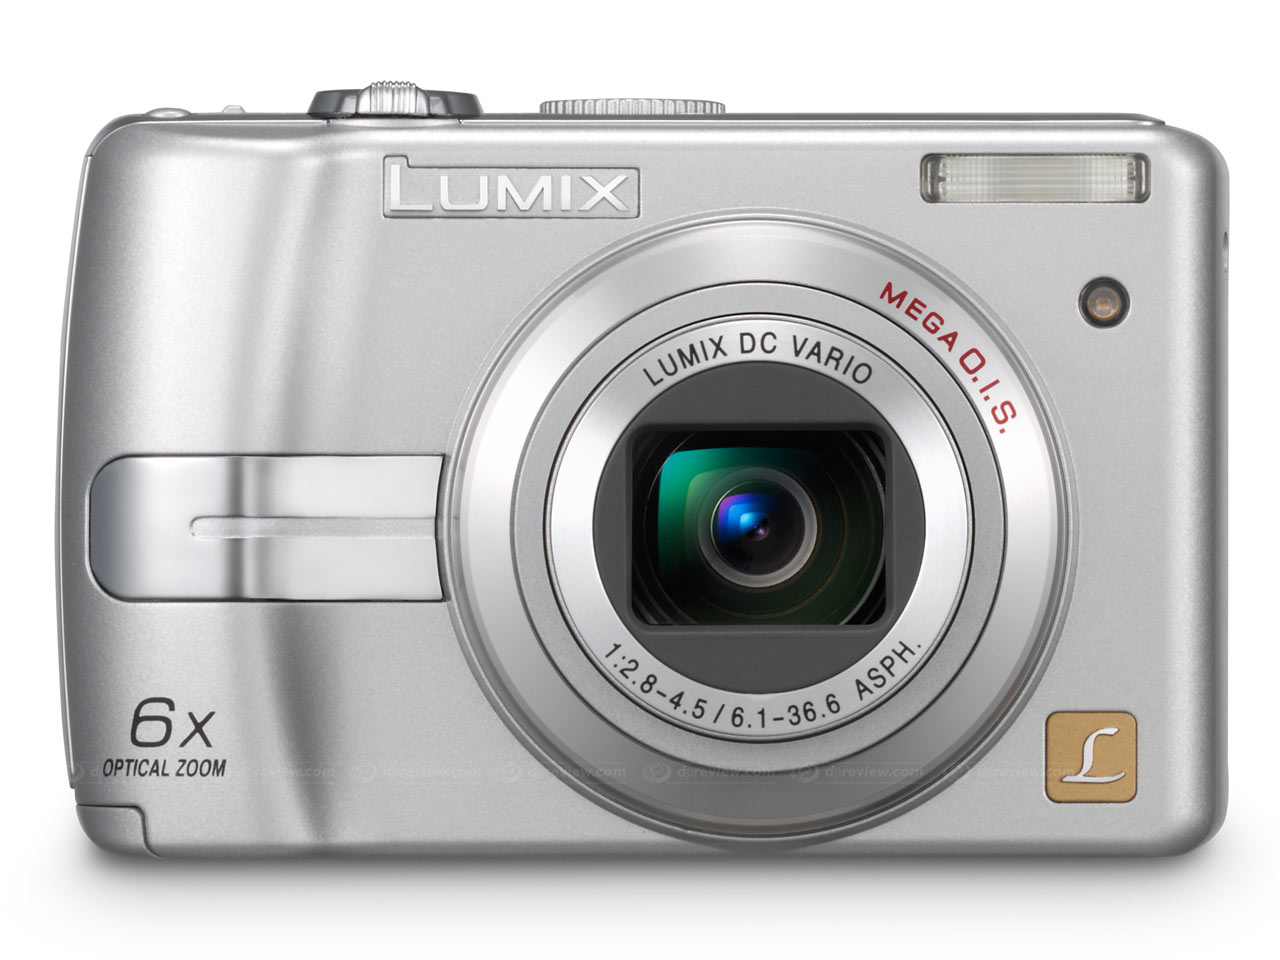 panasonic lumix dmc lz6 dmc lz7 digital photography review rh dpreview com Panasonic Lumix G Panasonic Lumix G